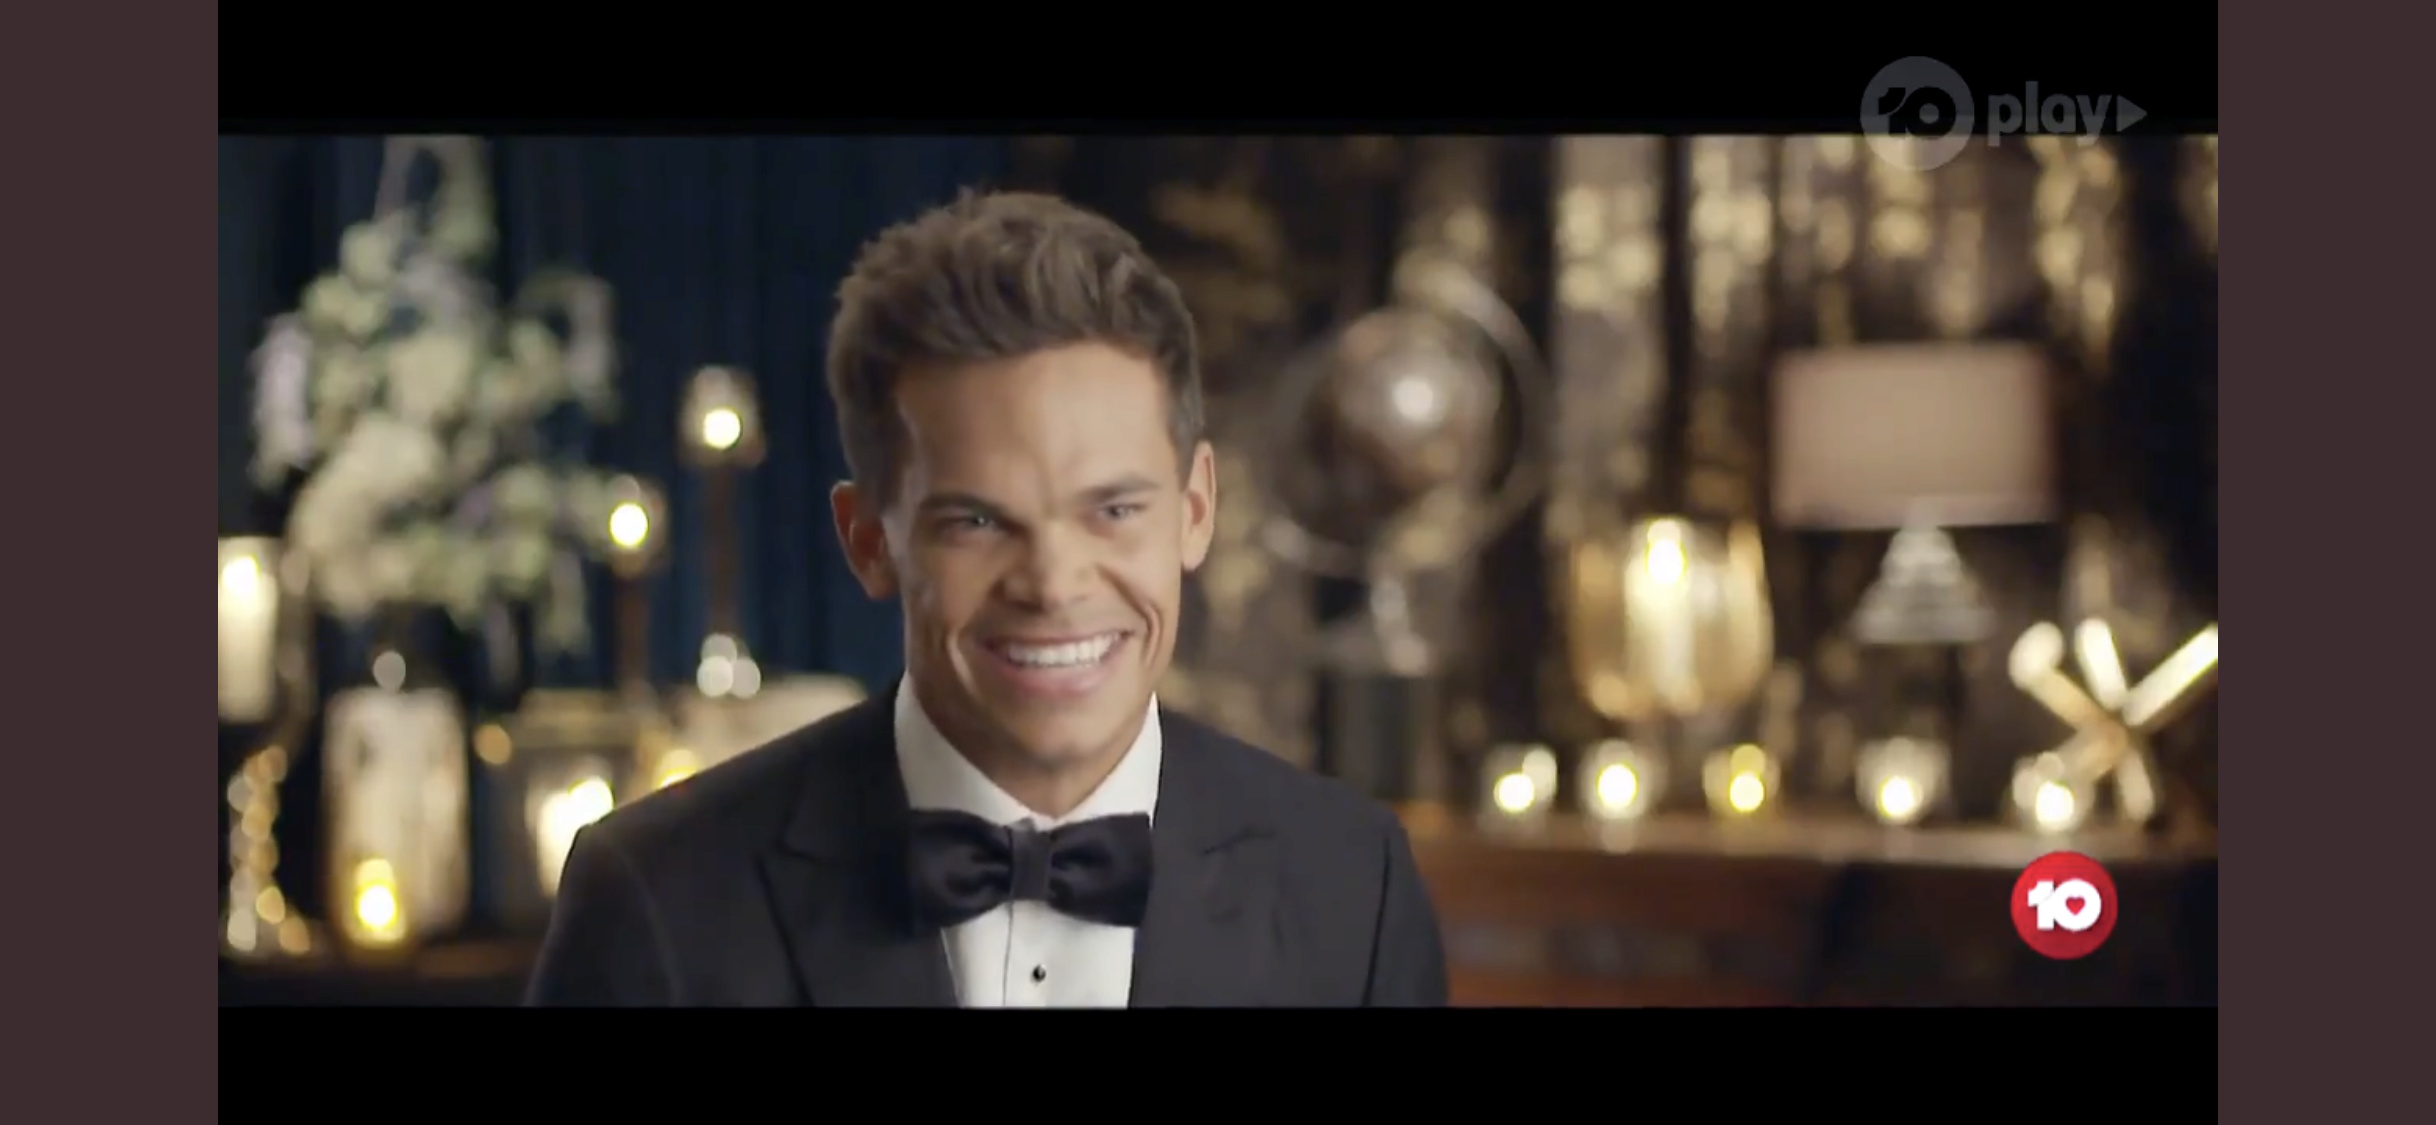 Bachelor Australia - Season 9 - Jimmy Nicholson - S/Caps - *Sleuthing Spoilers*  Img_3516